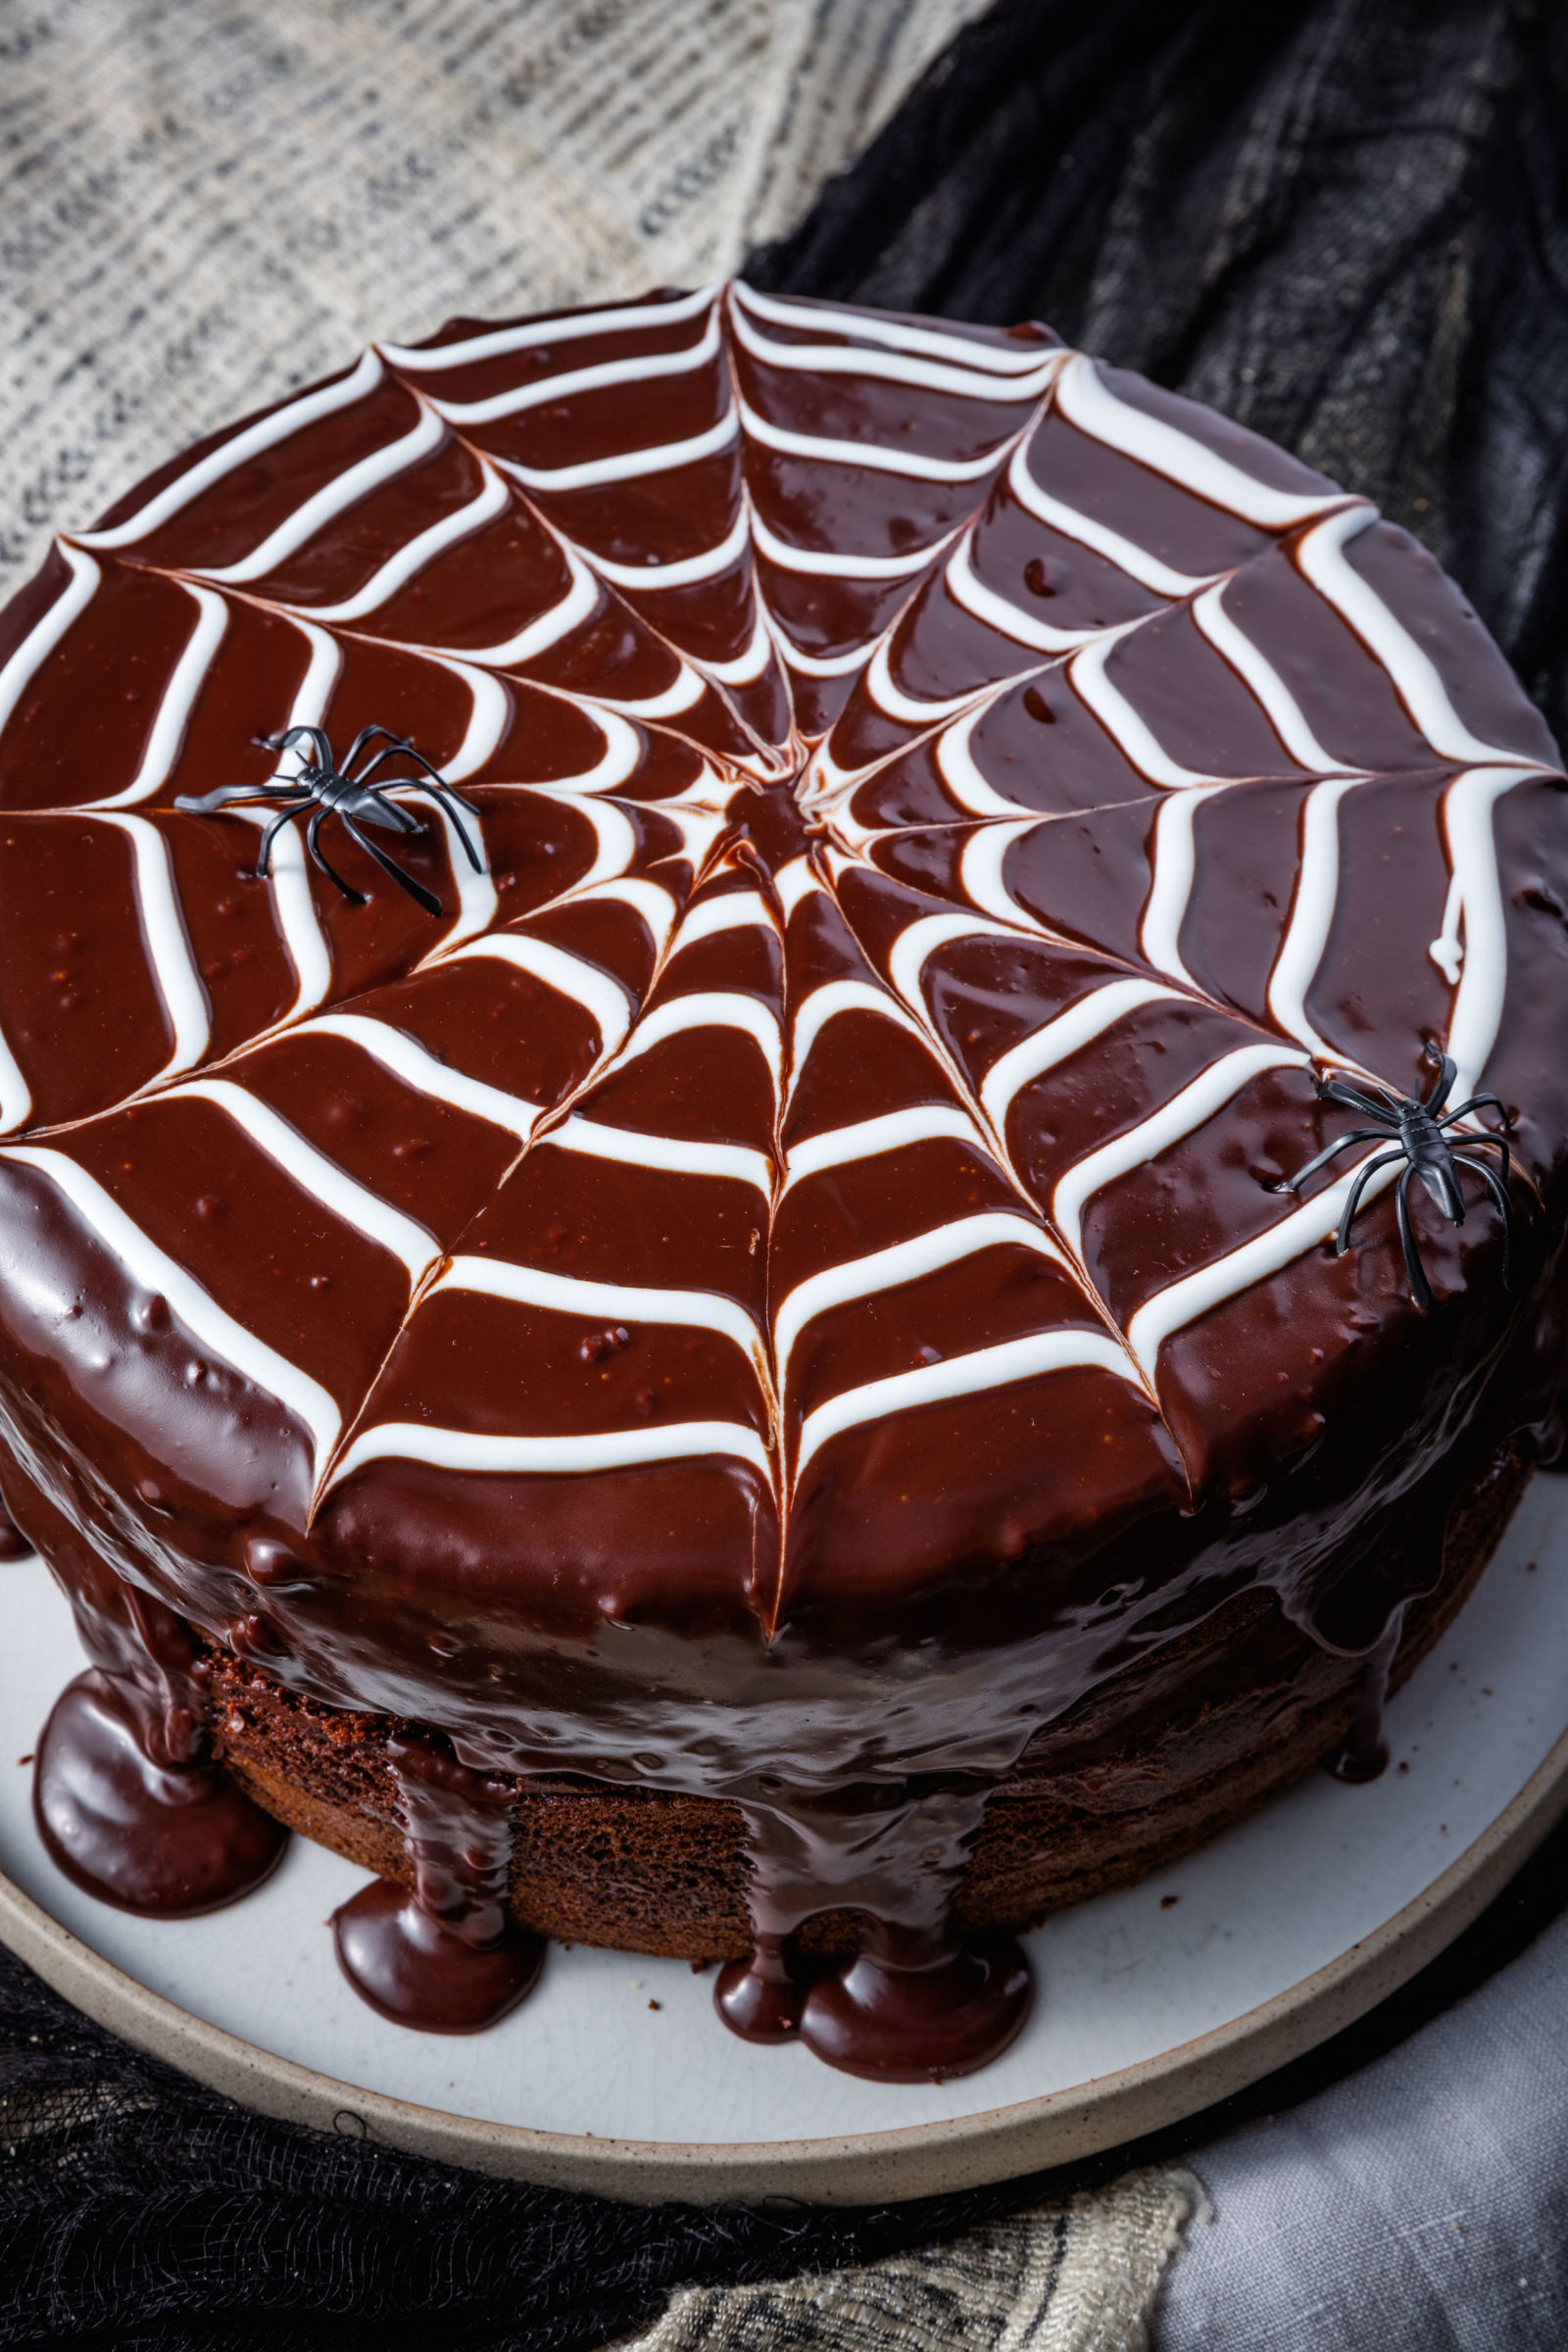 17 Easy Halloween Recipes - Gross and Scary Halloween Food Ideas ...